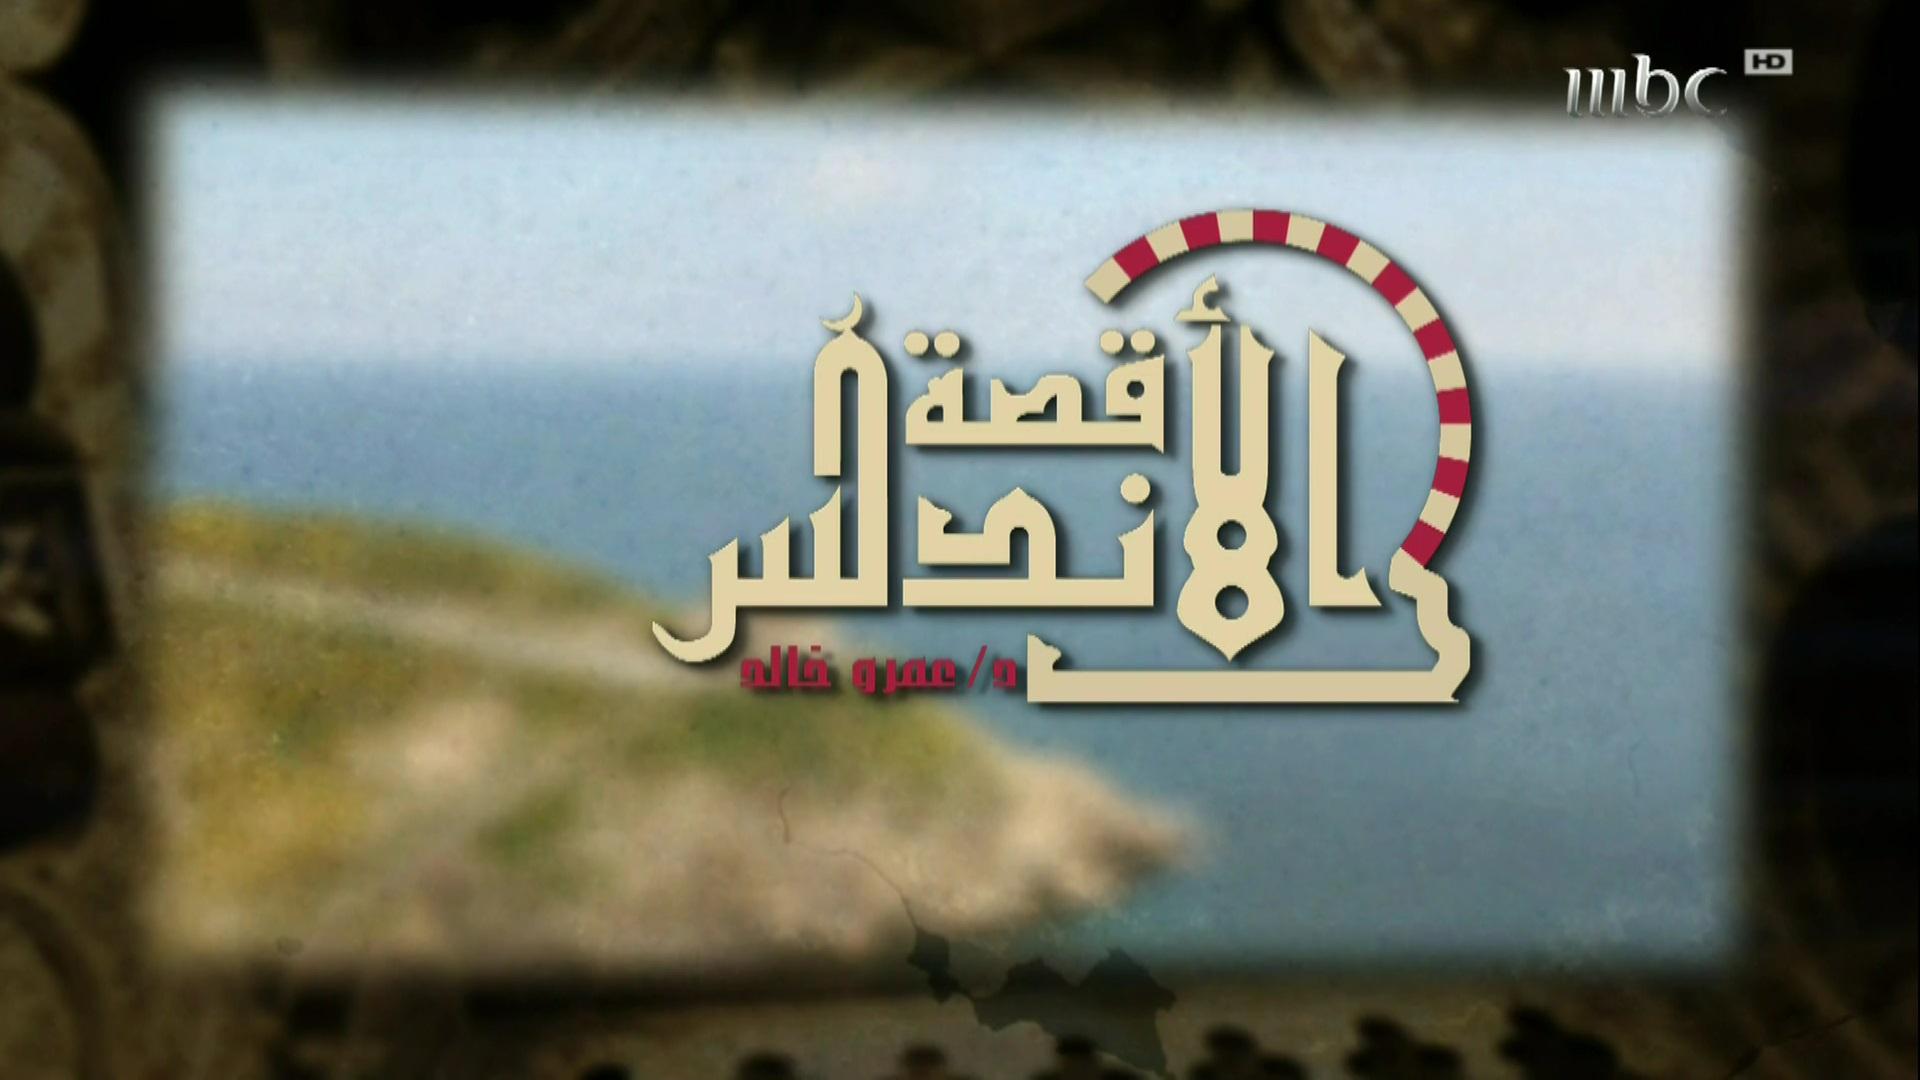 HDTV-720p | قصة الأندلس (عمرو خالد ) كامل 2013 -- Seeders: 3 -- Leechers: 0